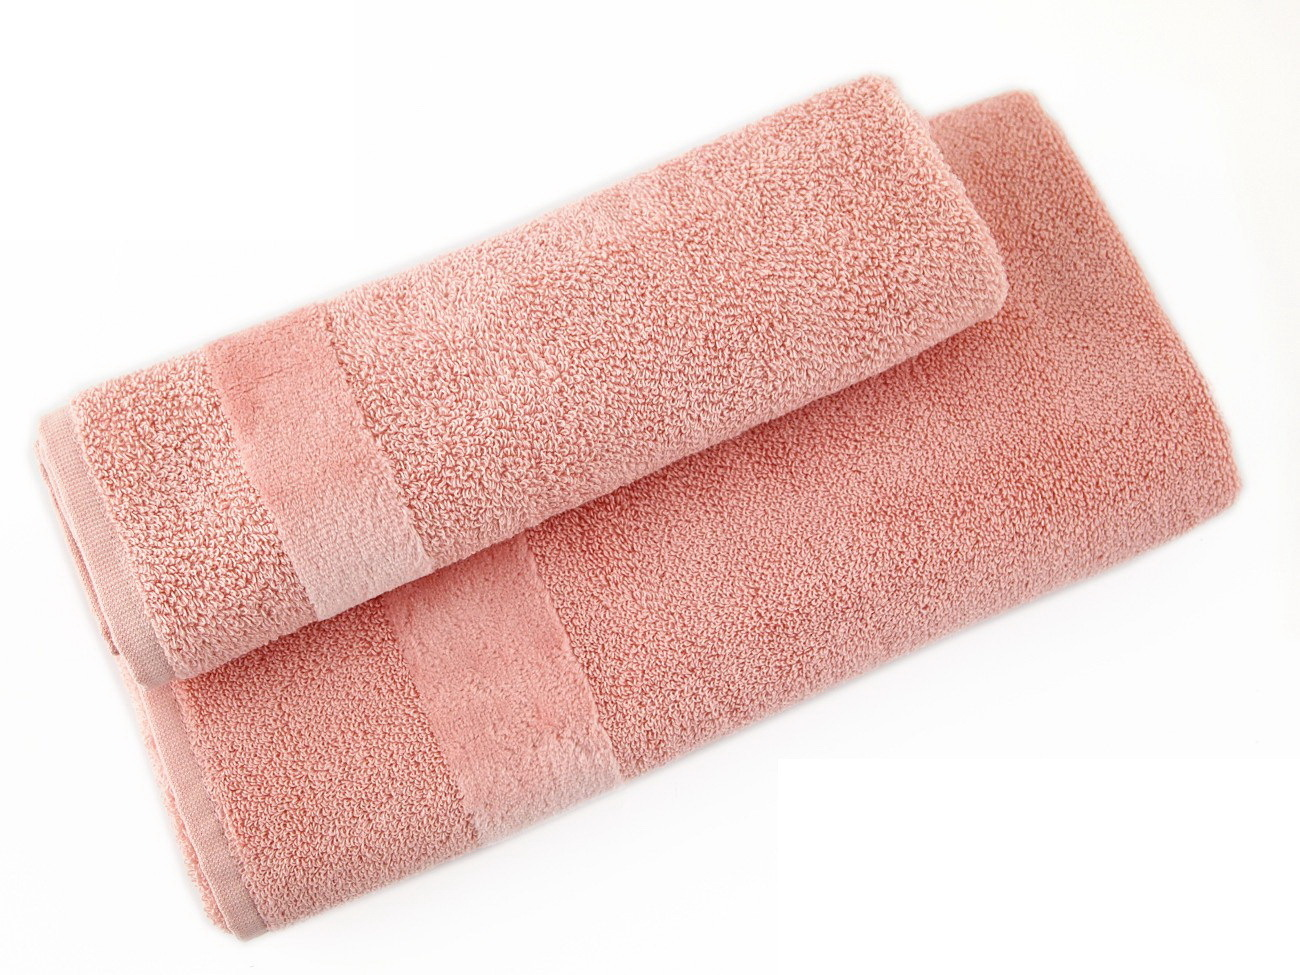 Наборы полотенец Набор полотенец 2 шт Carrara Fyber светло-розовый elitnye-polotentsa-mahrovye-fyber-504-svetlo-rozovye-ot-carrara-italiya.JPG